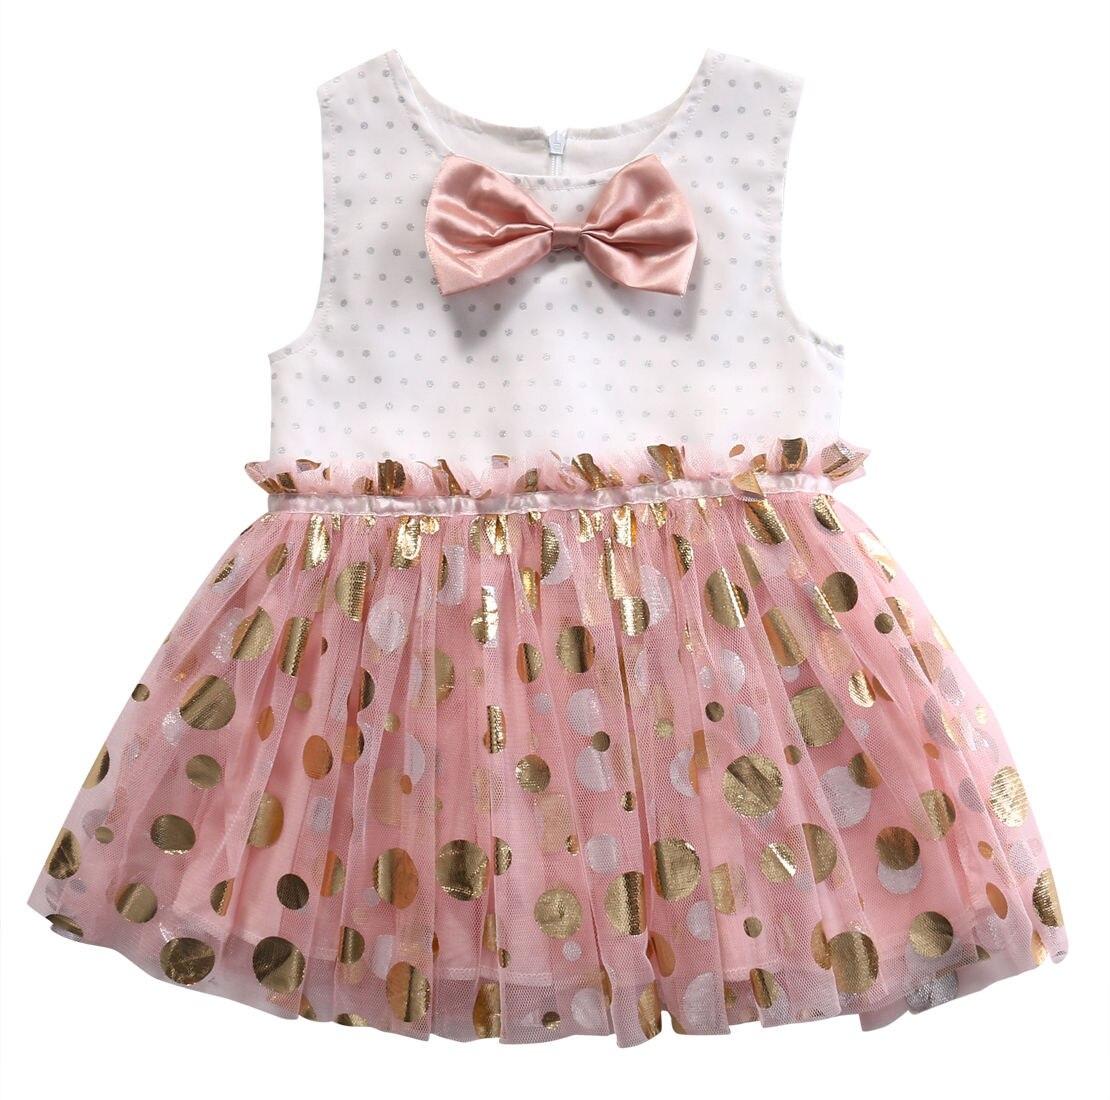 Baby girl pink sequin dress - Kids Girl Ball Gown Princess Pink Dress Toddler Bow Sequins Dress Summer China Mainland